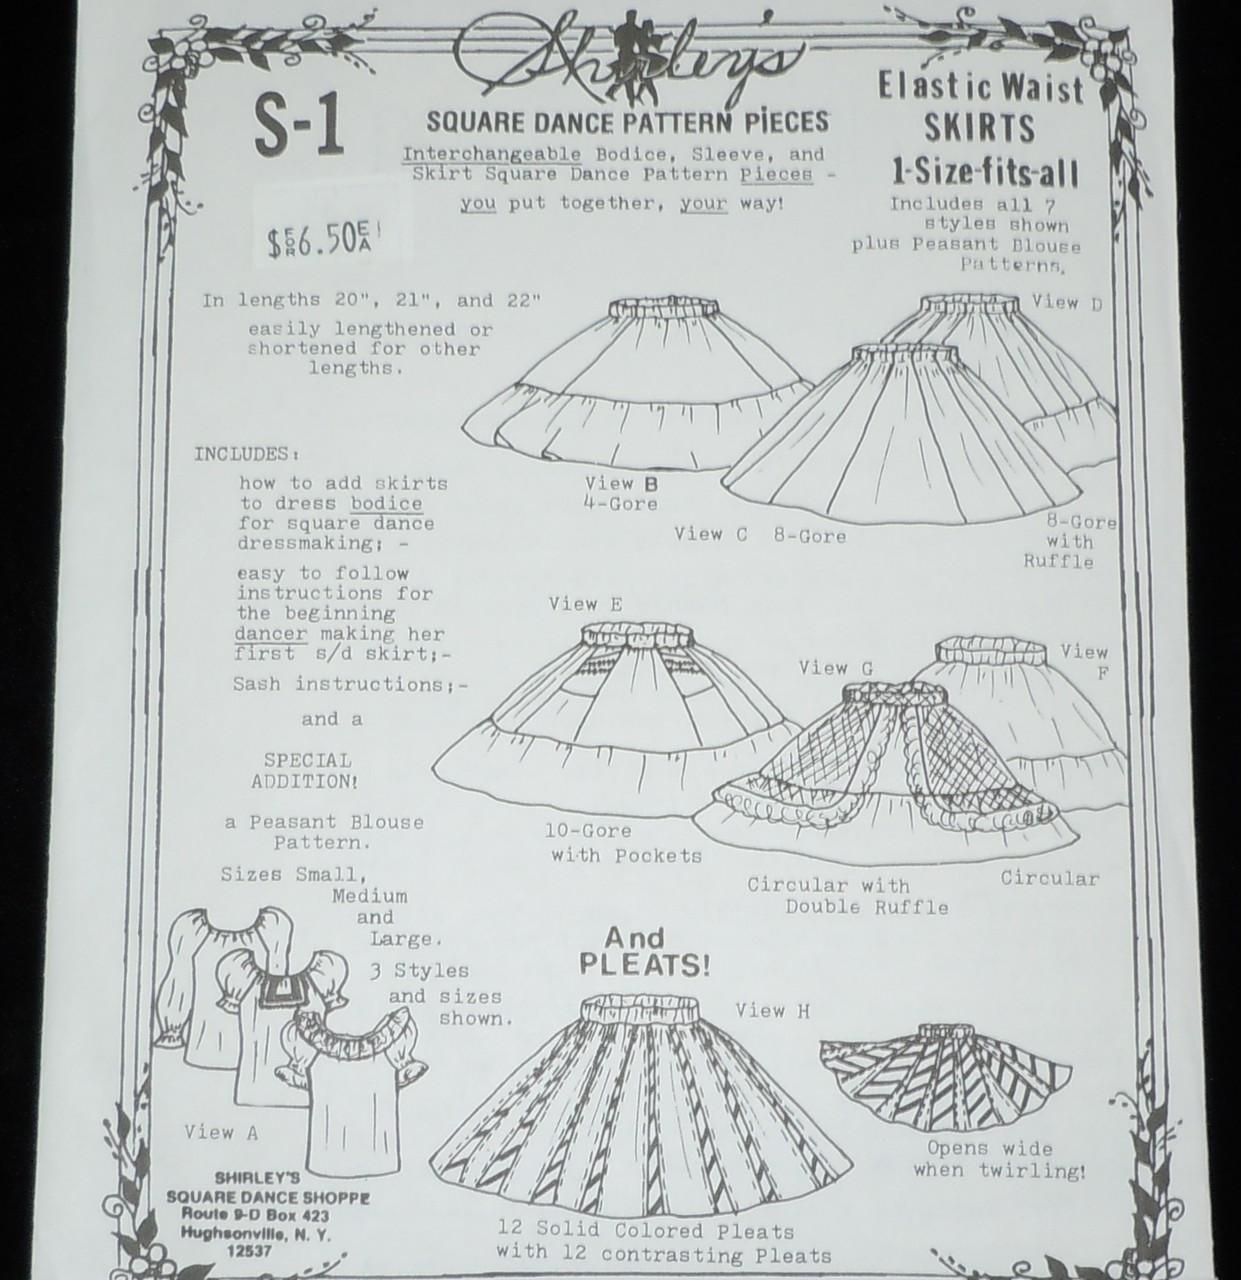 6e09085f2c41 S-1 Shirley's Square Dance Skirt Pattern - Brantleys Western & Casual Wear